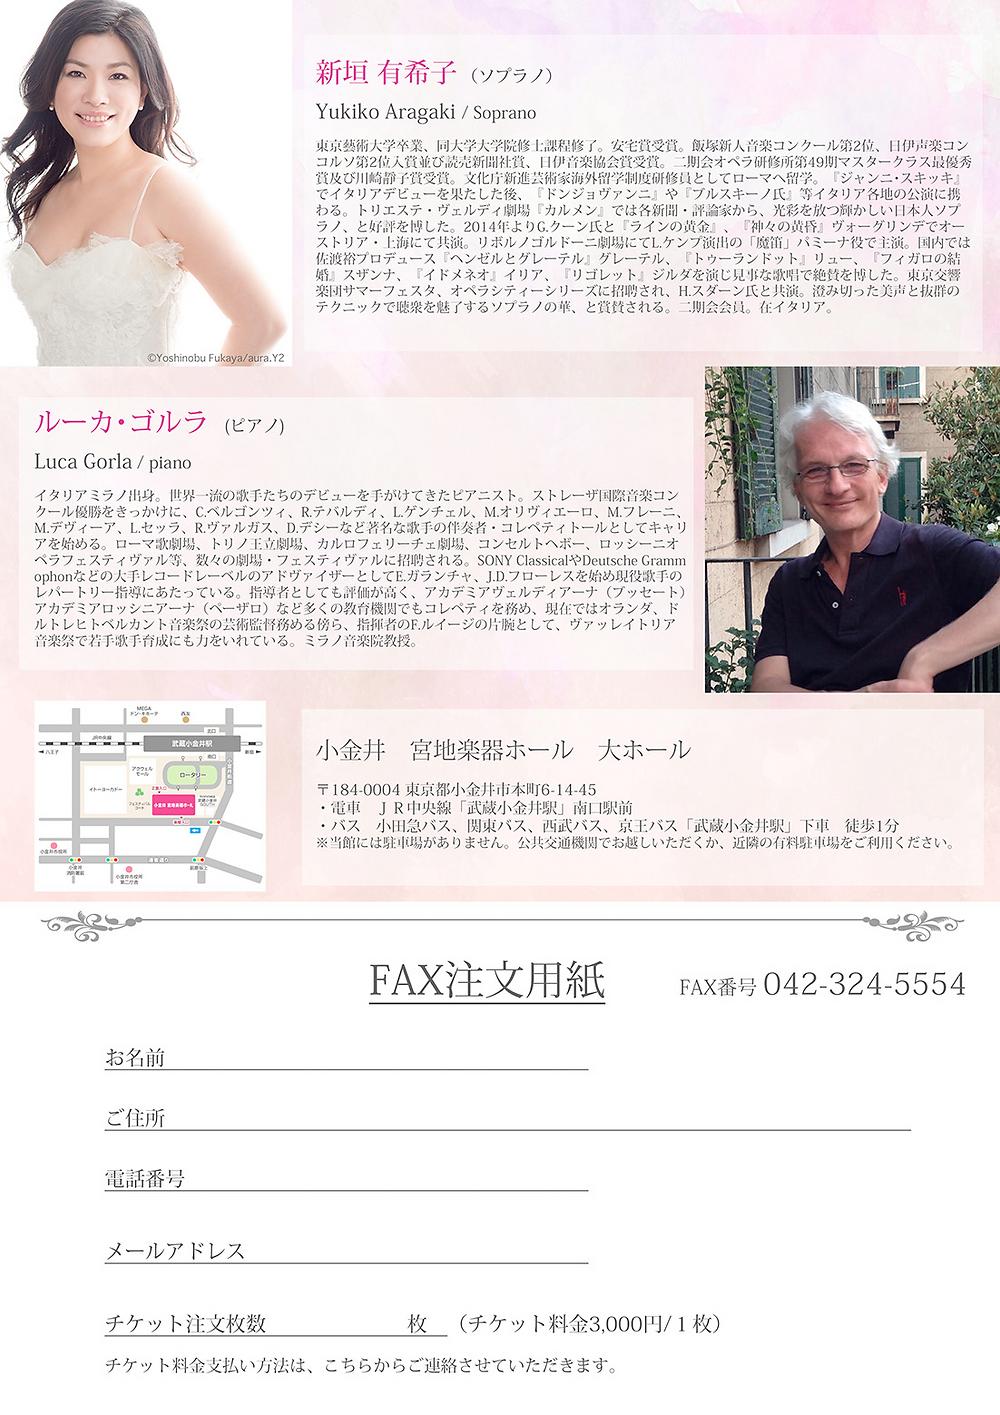 Yukiko ARAGAKI soprano Recital